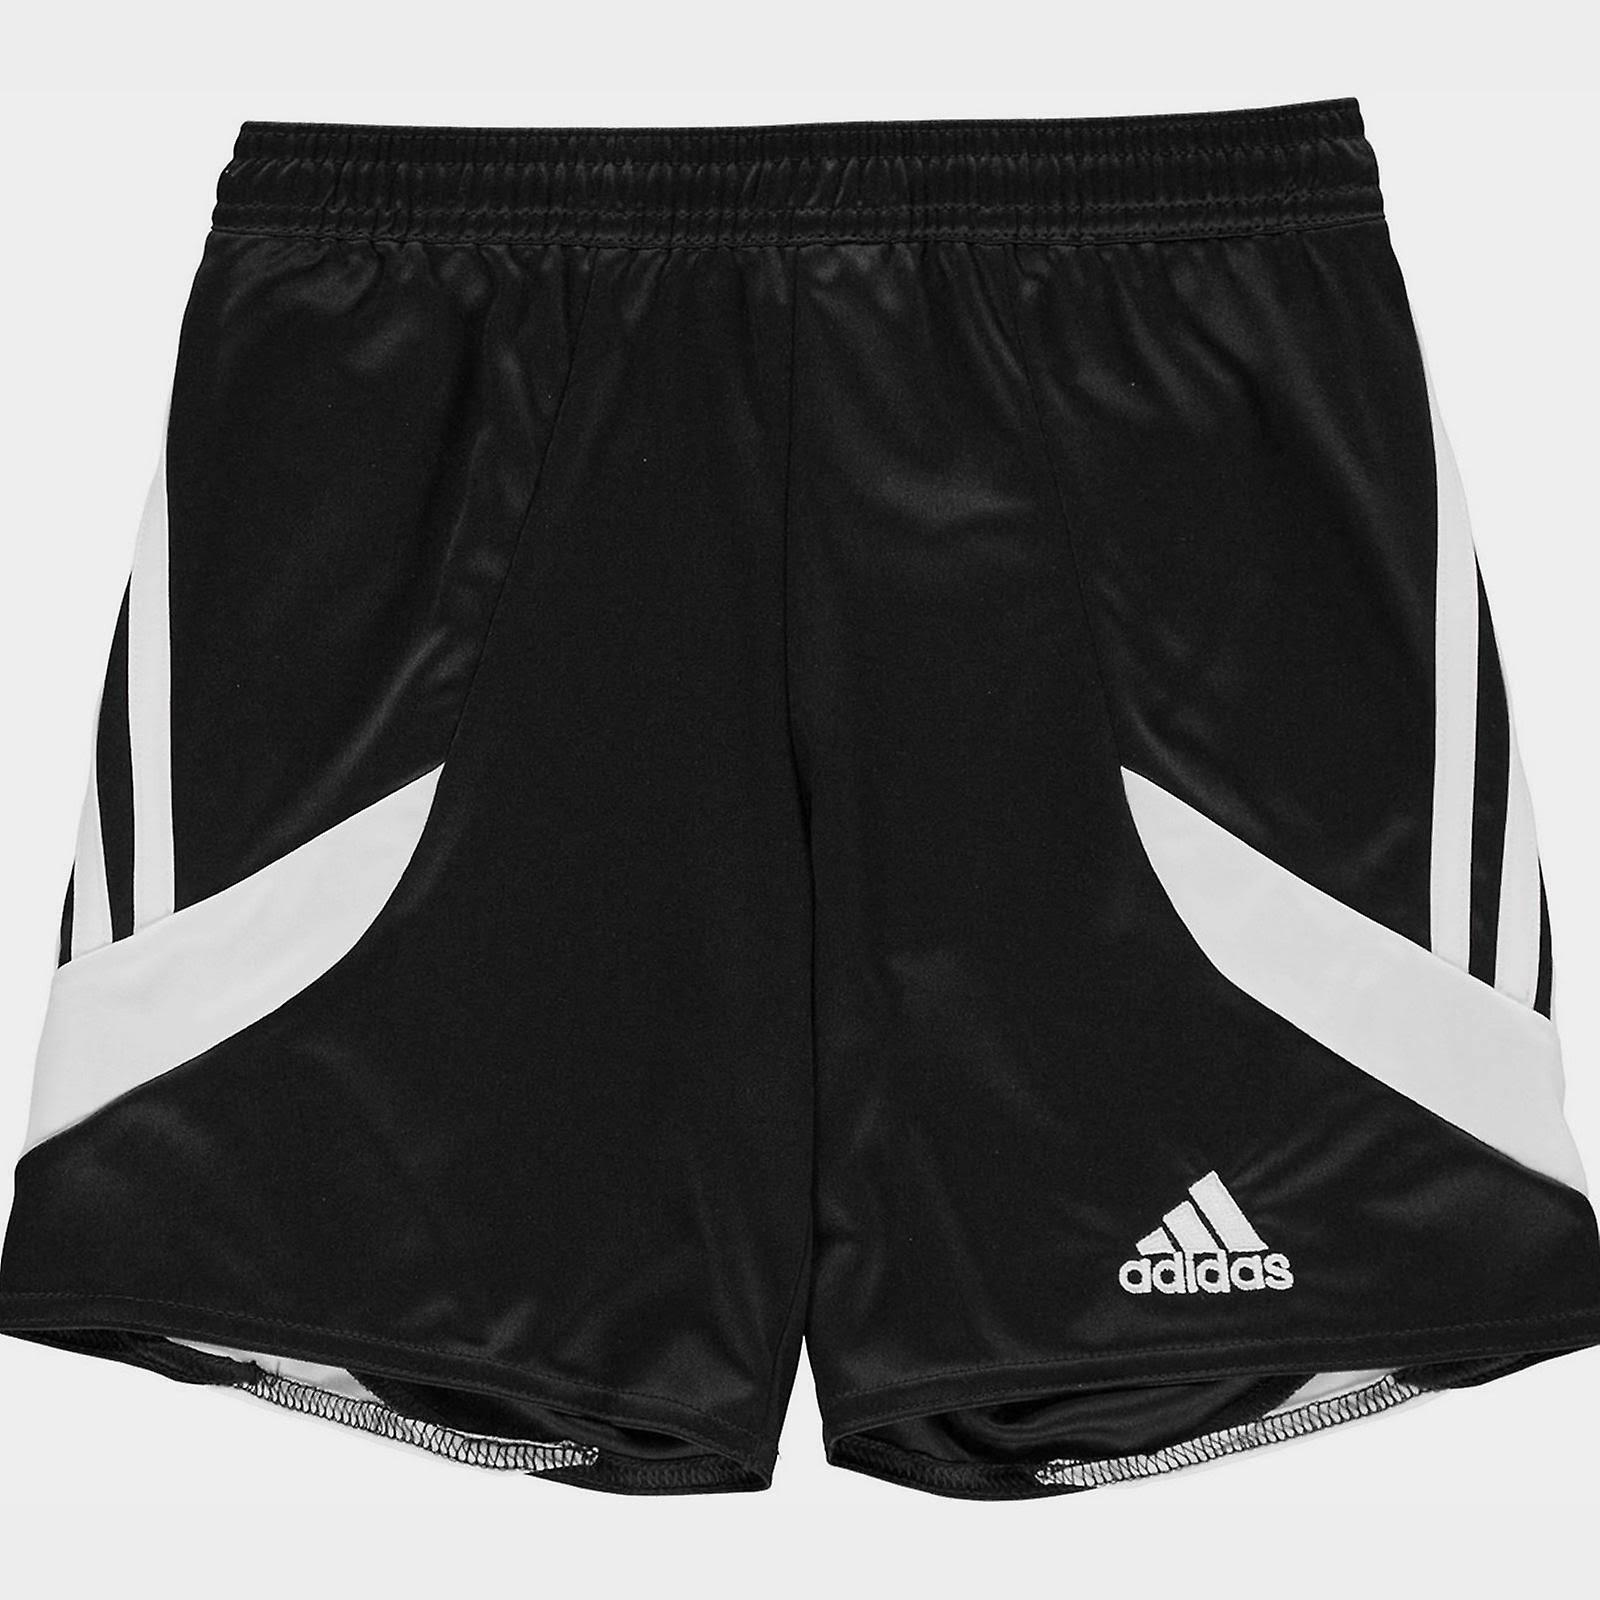 Adidas 3 Stripe Shorts Junior Boys - Black/White  hWfggWN